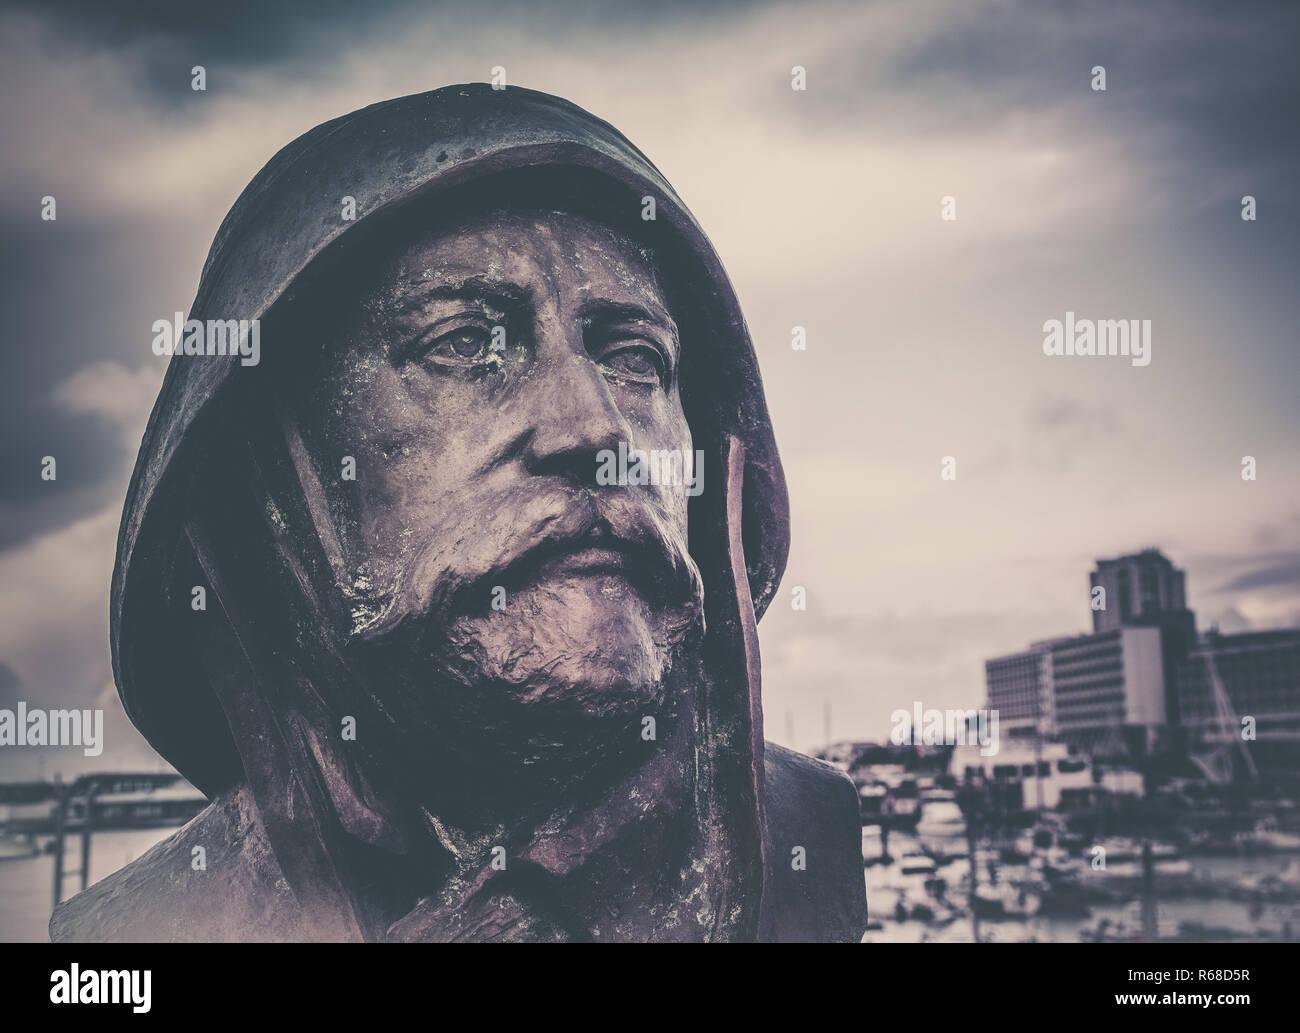 Soldier face sculpture Stock Photo